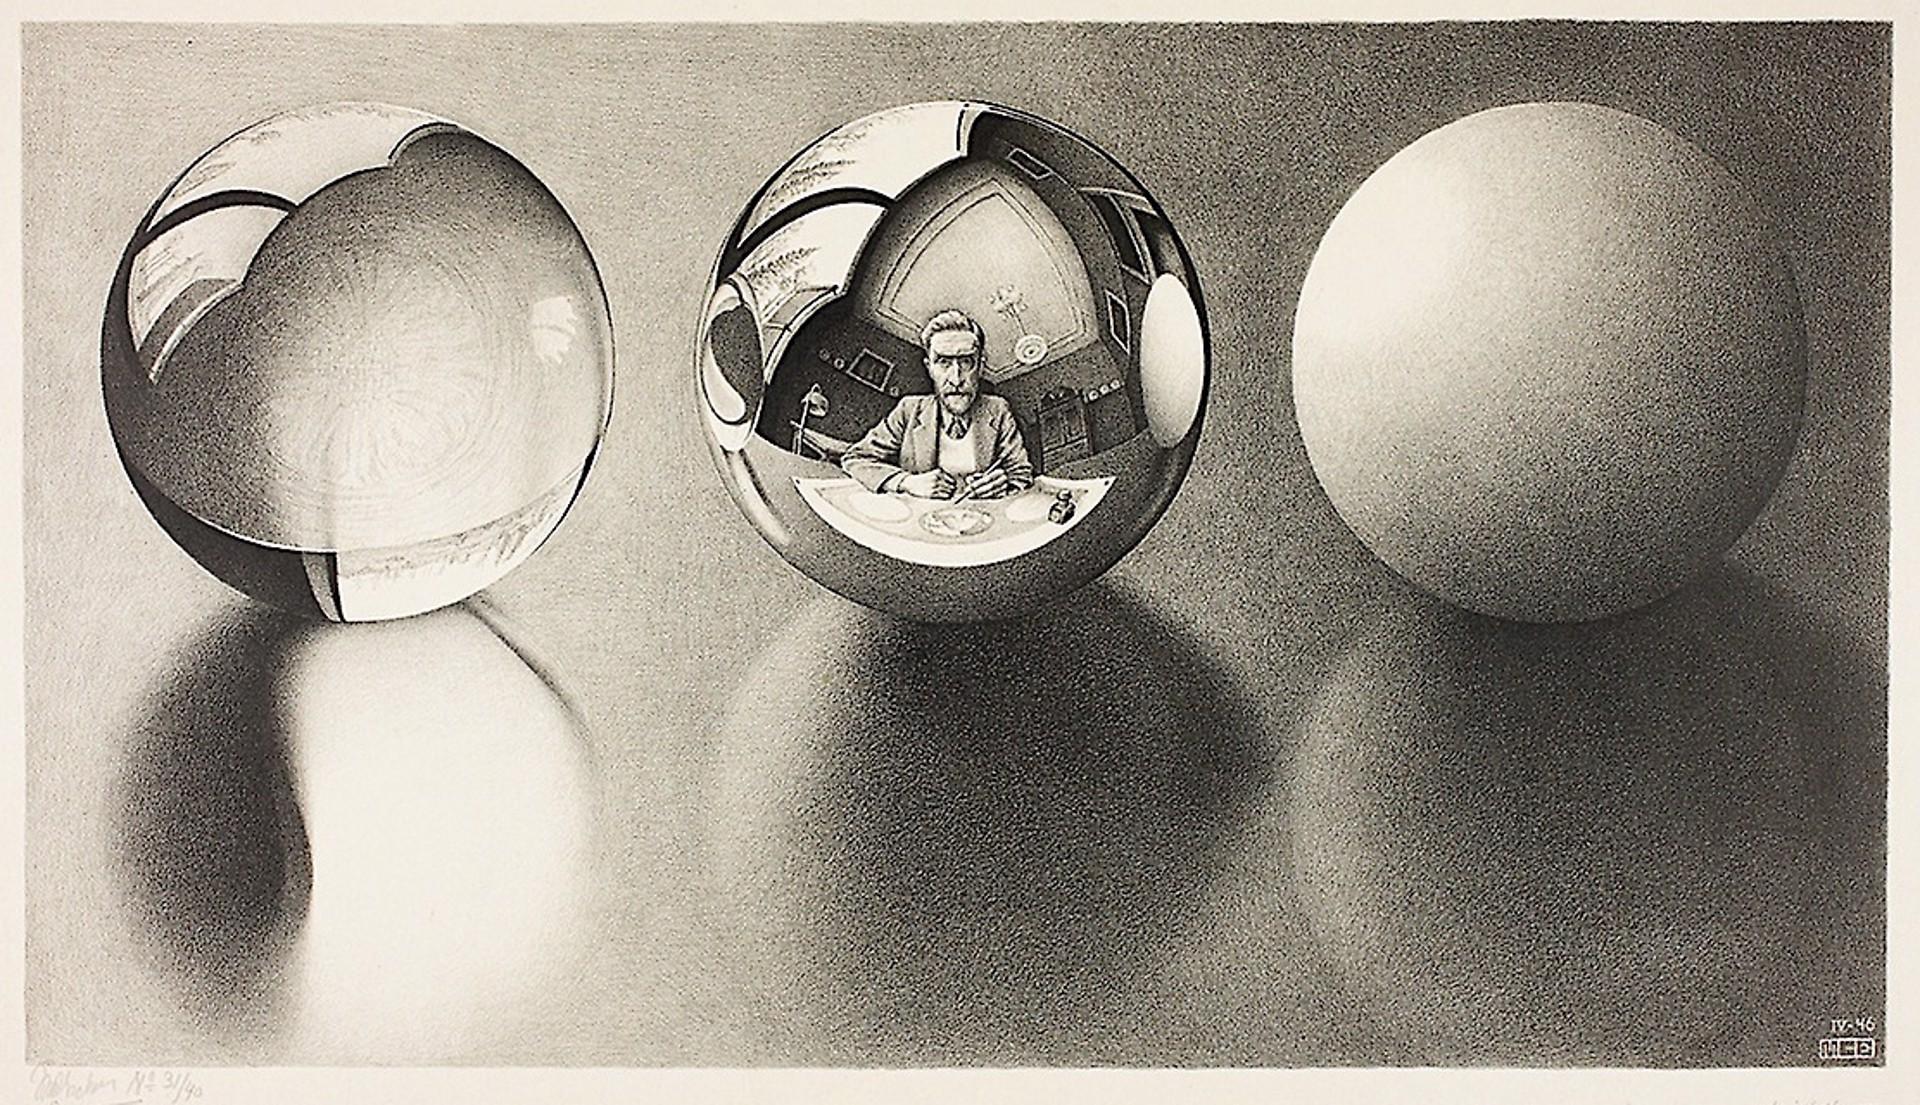 Three Spheres II by M.C. Escher